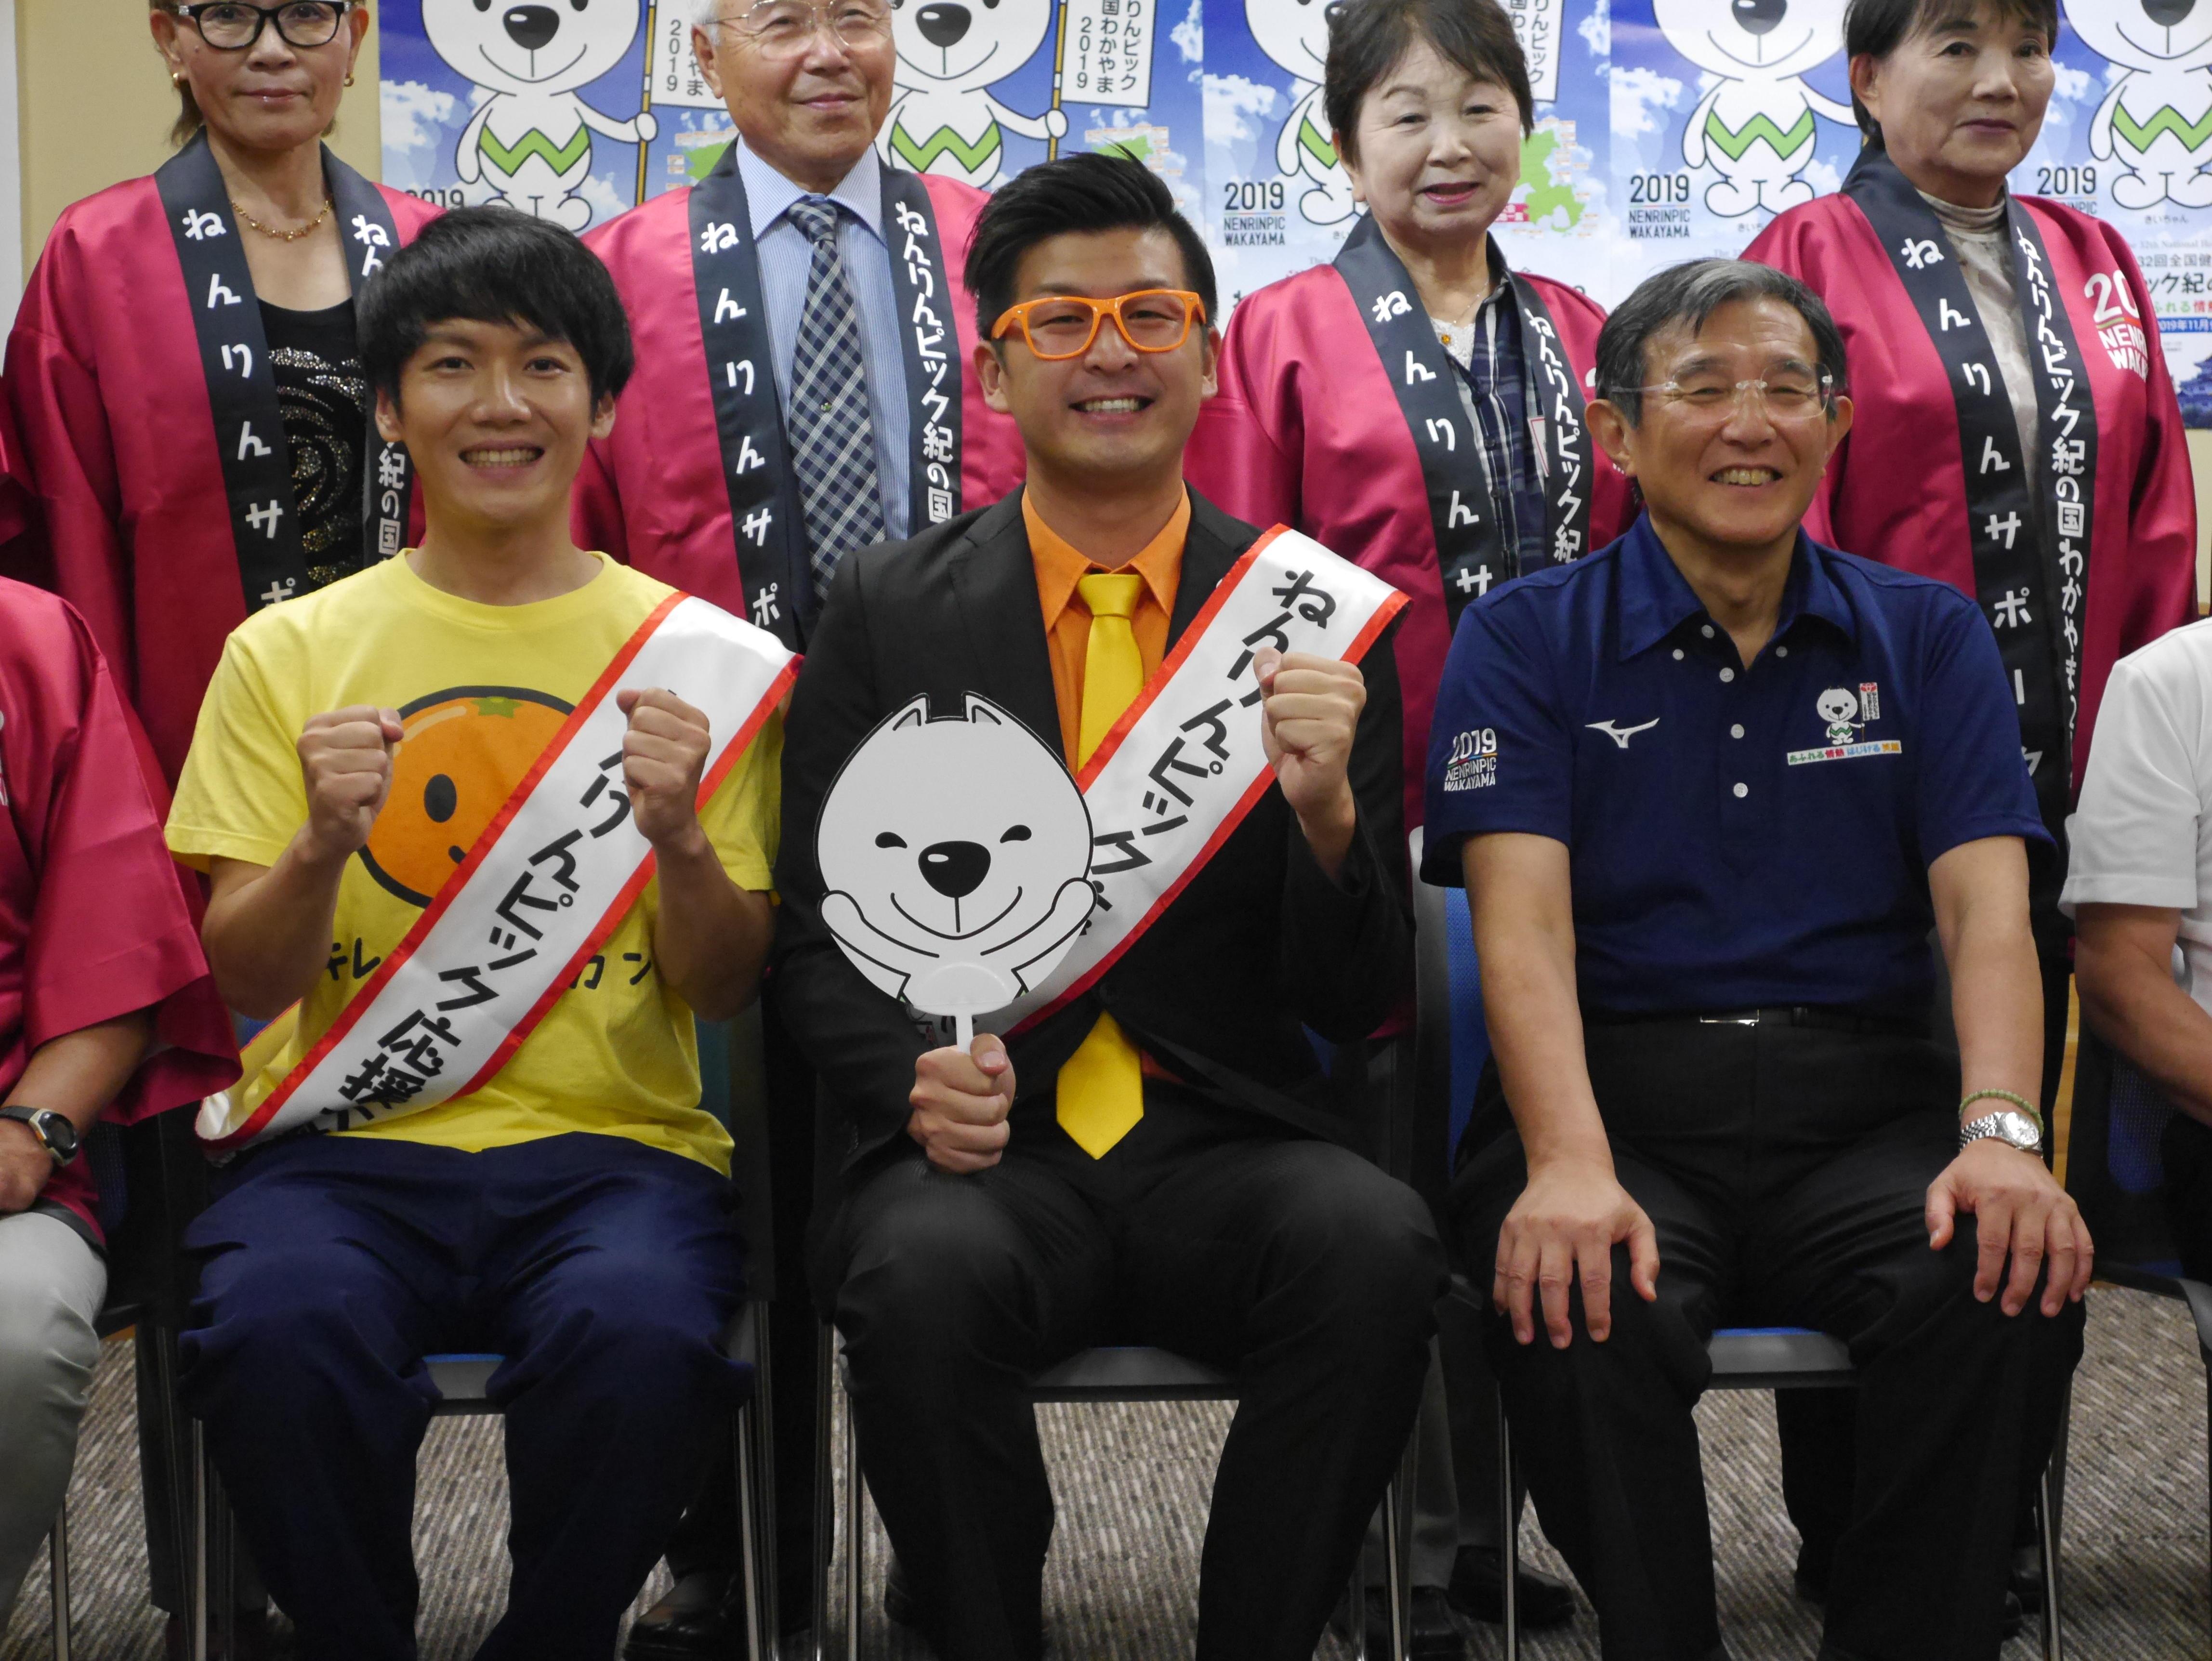 http://news.yoshimoto.co.jp/20181005203319-8cdc251e986f85547d634cdcc92fbea931a3e90b.jpg